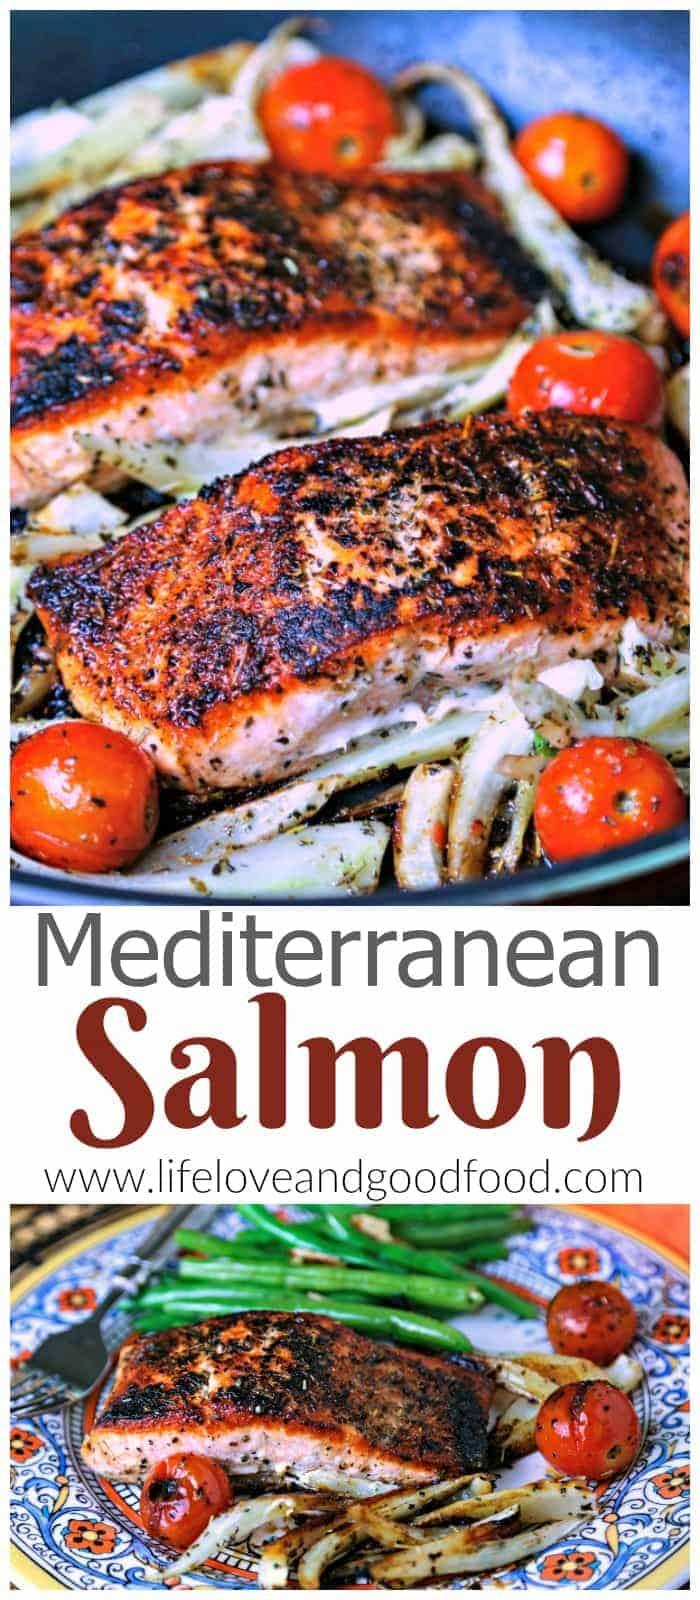 A close up of Mediterranean Salmon